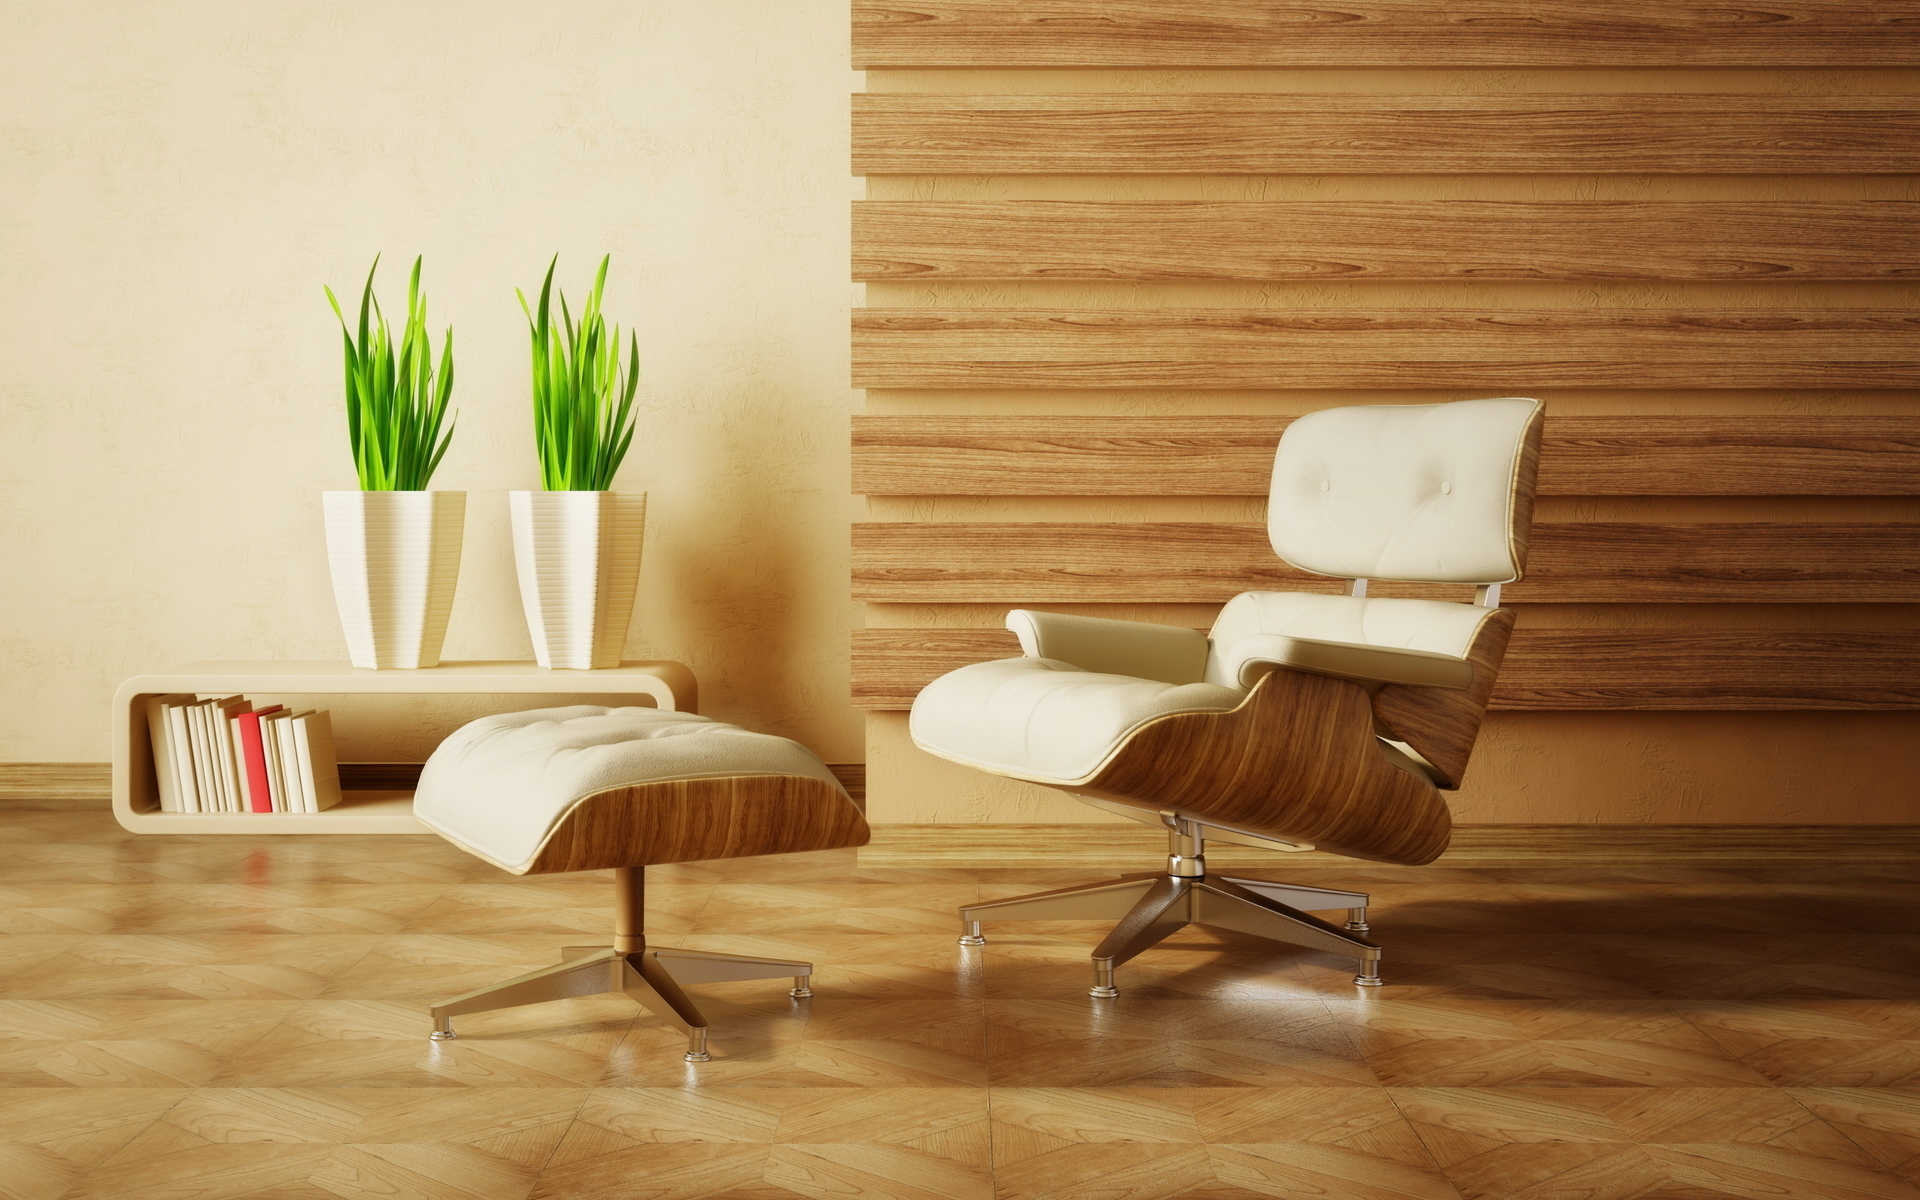 40 Interior Design Ideas as Wallpapers 1920x1200